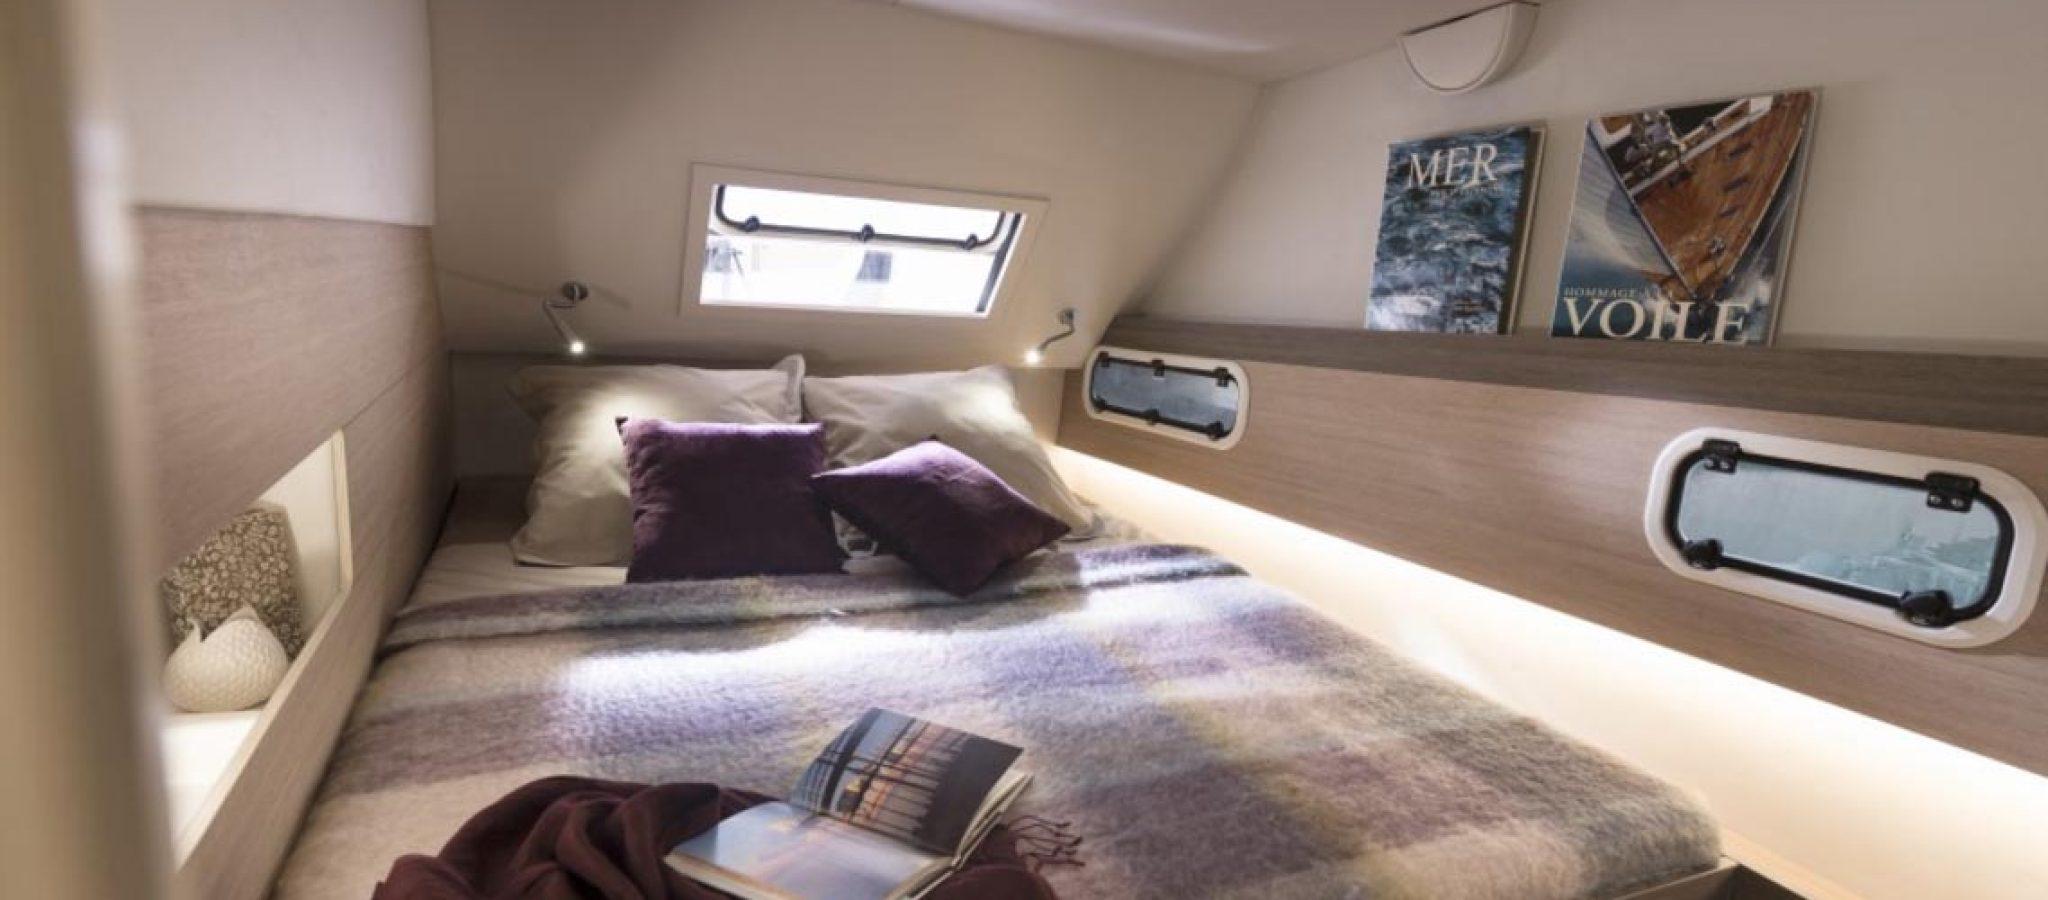 Bali 4.0 cabine